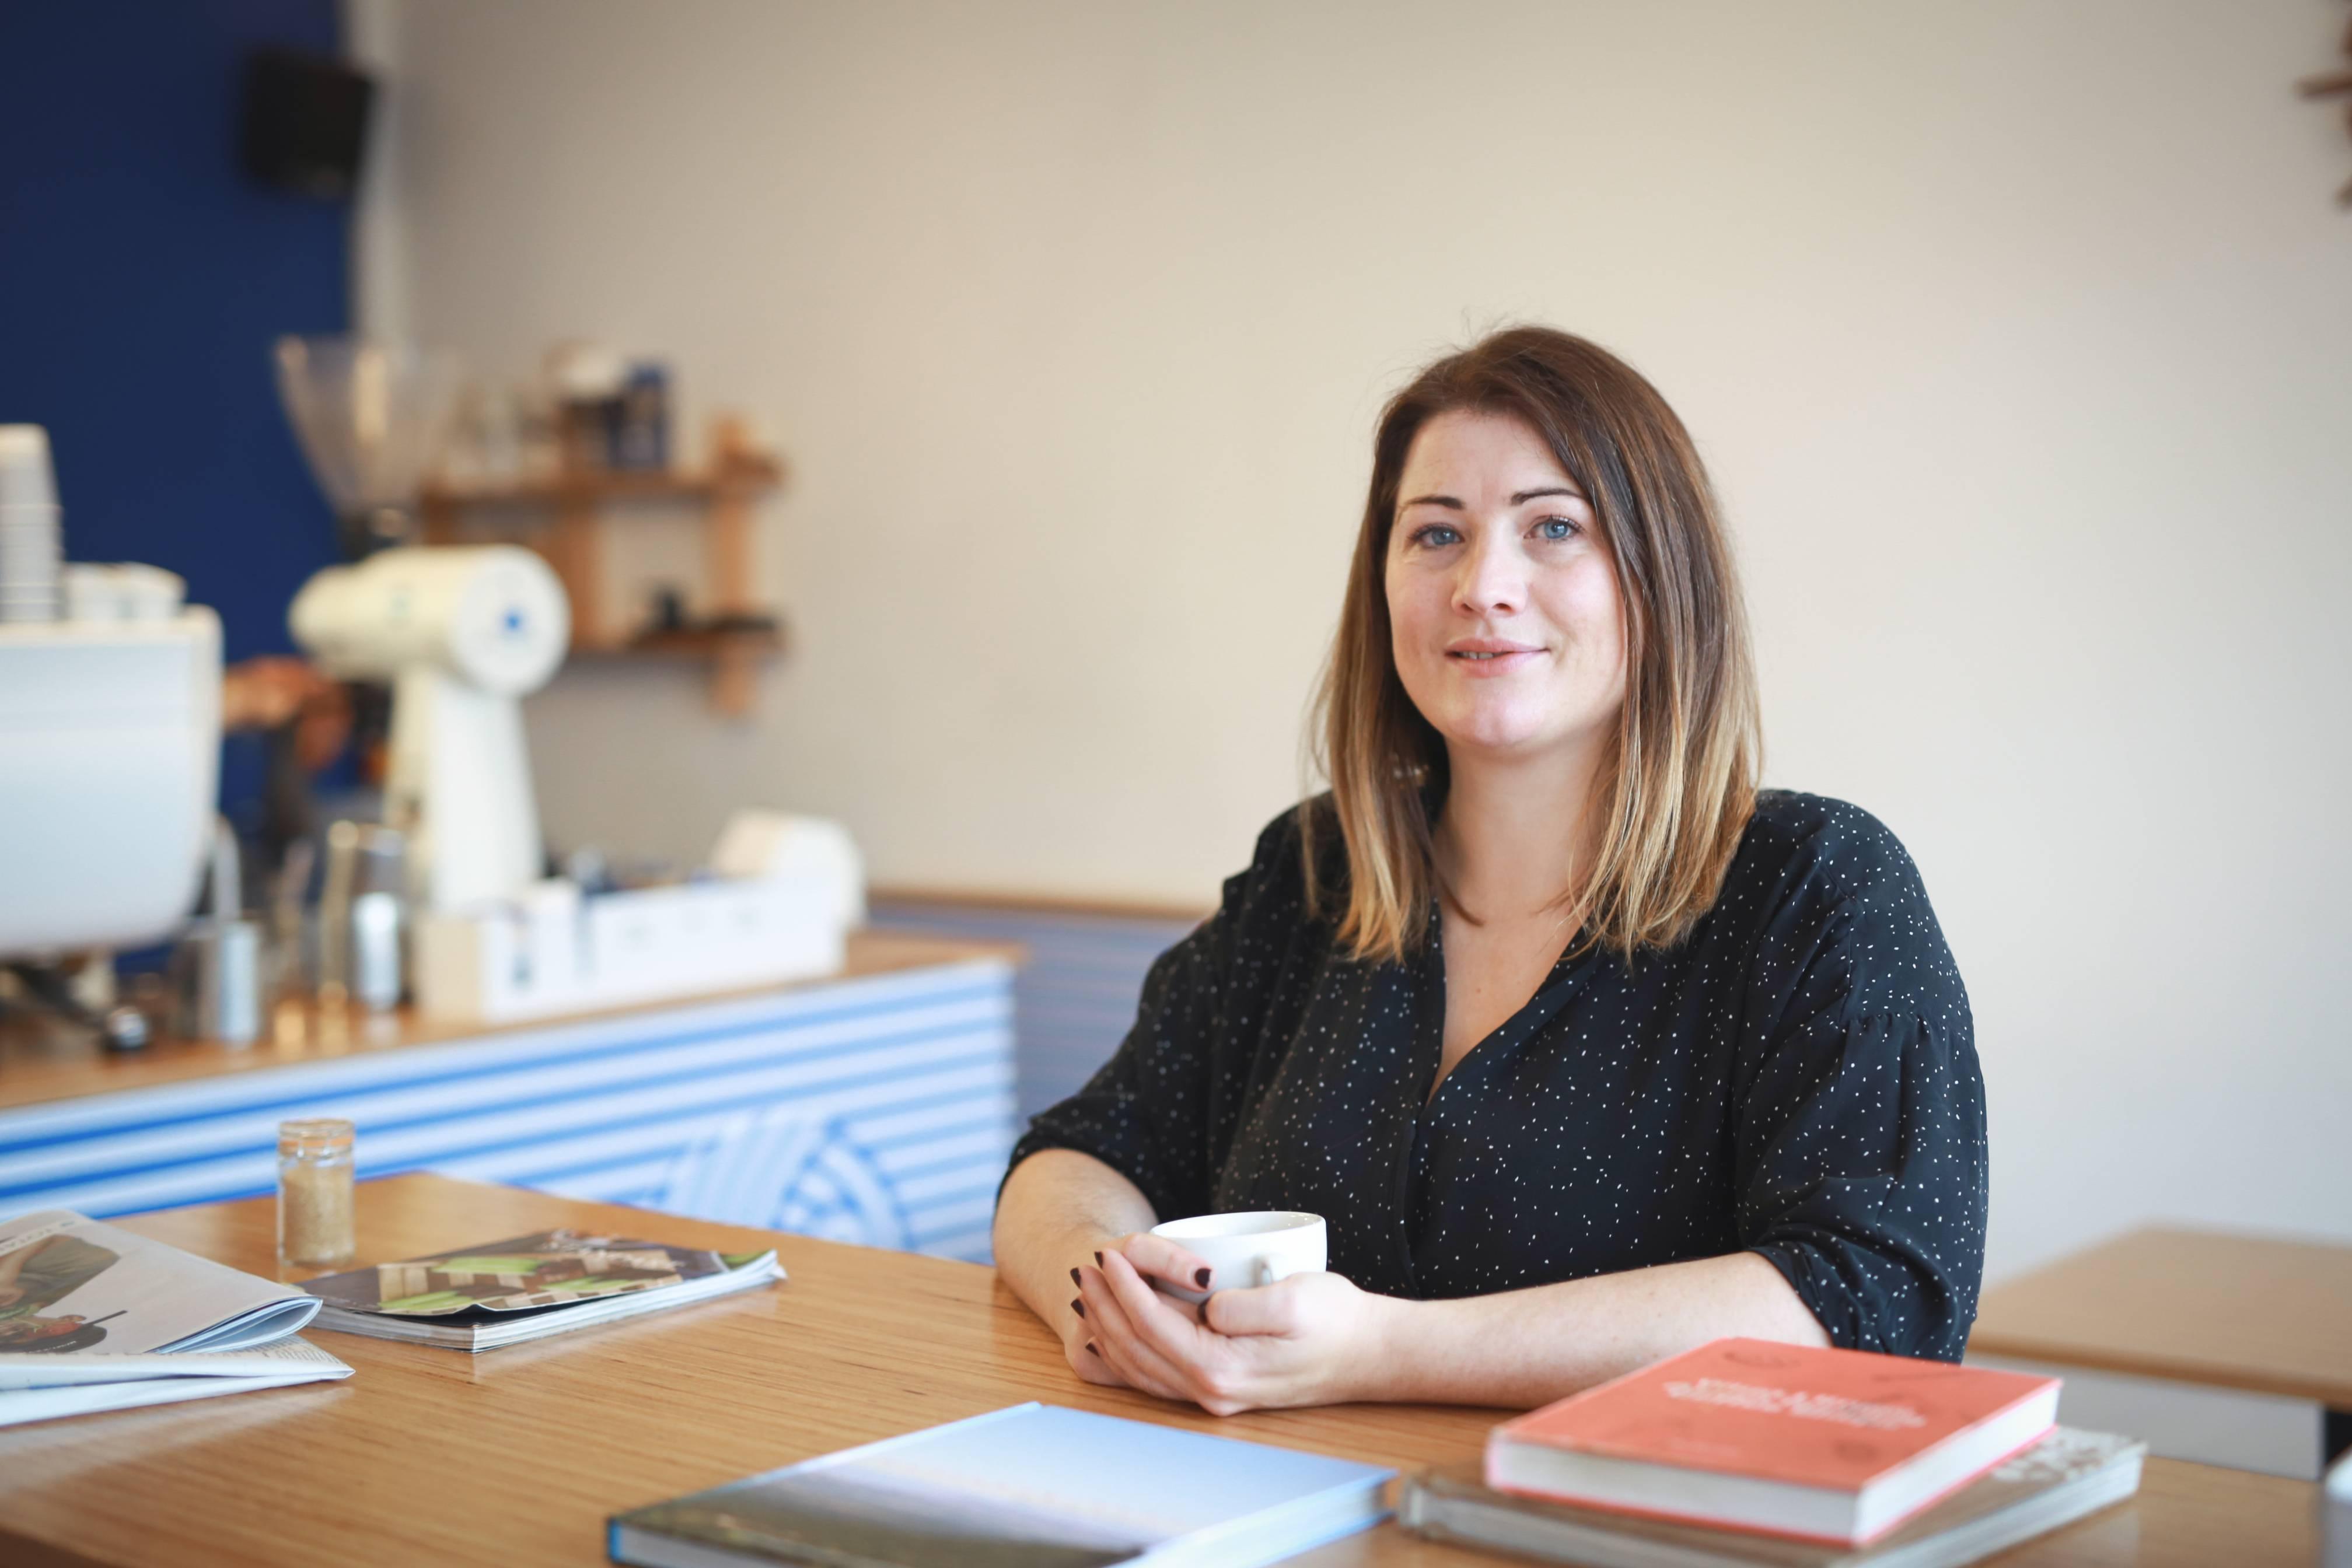 Women Of The Irish Food Industry – Ali Dunworth, Food Writer & Consultant